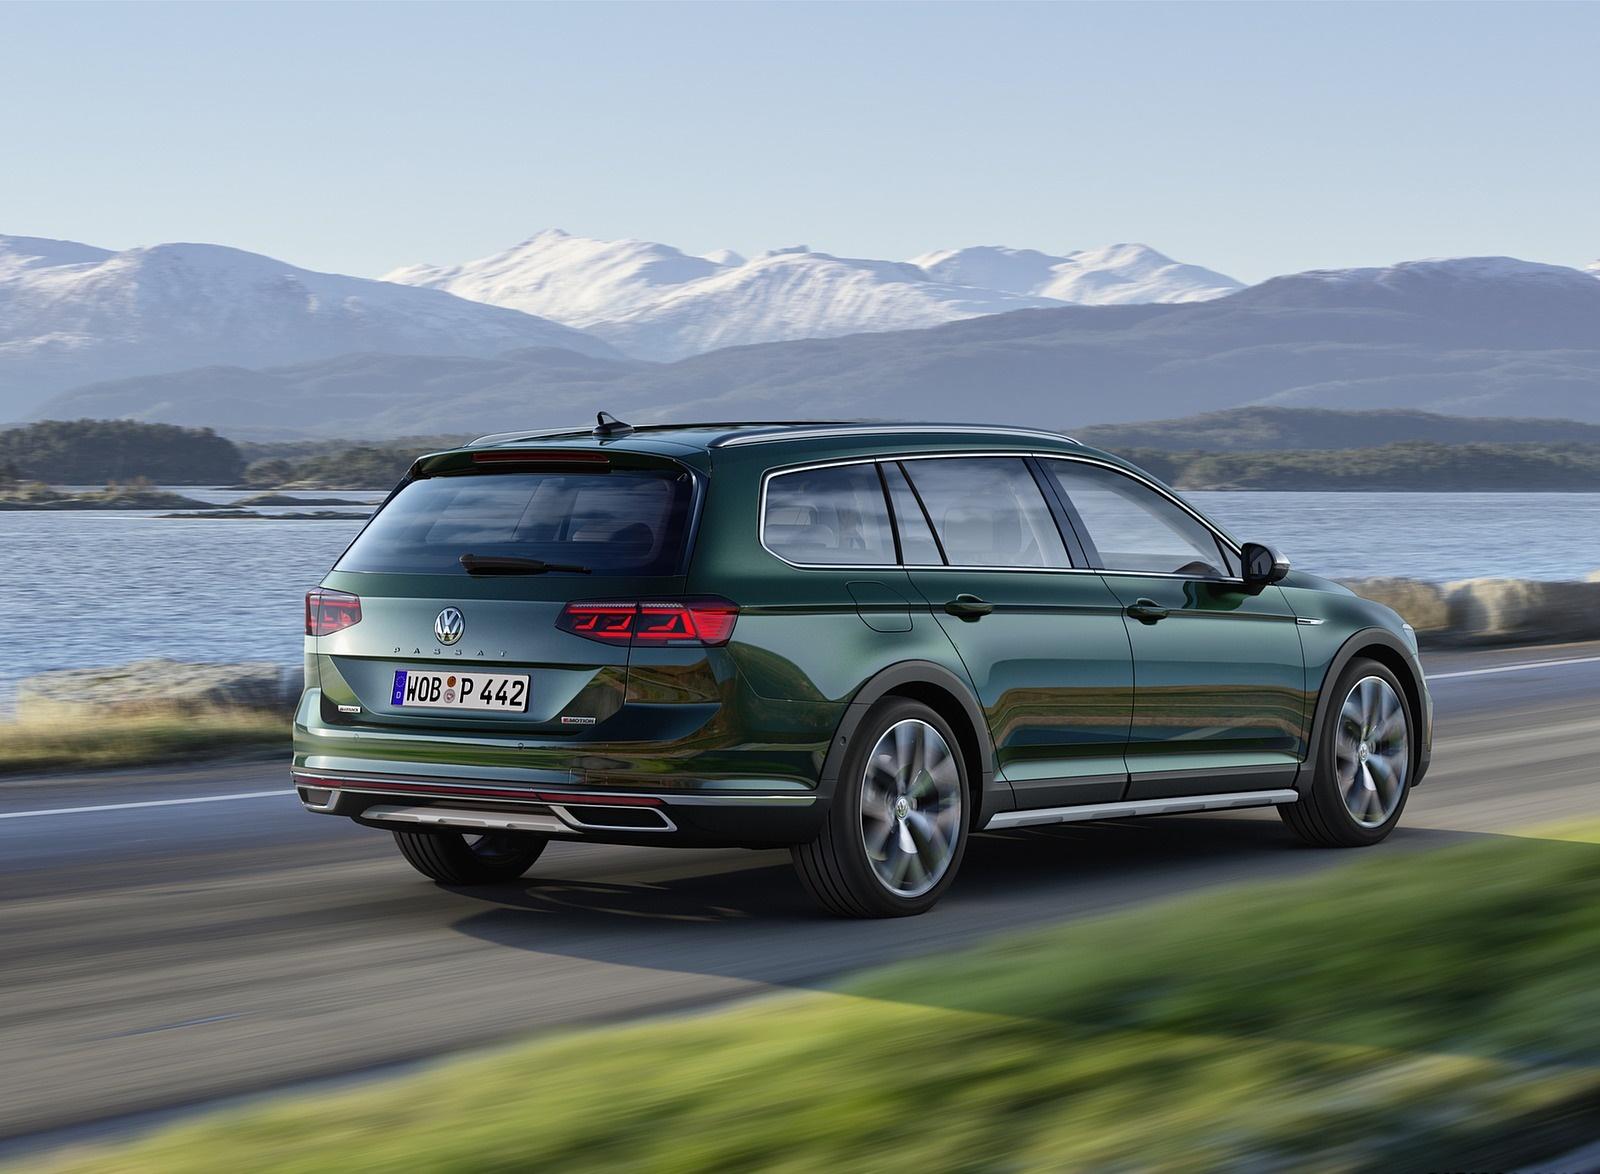 2020 Volkswagen Passat Alltrack (EU-Spec) Rear Three-Quarter Wallpapers (3)